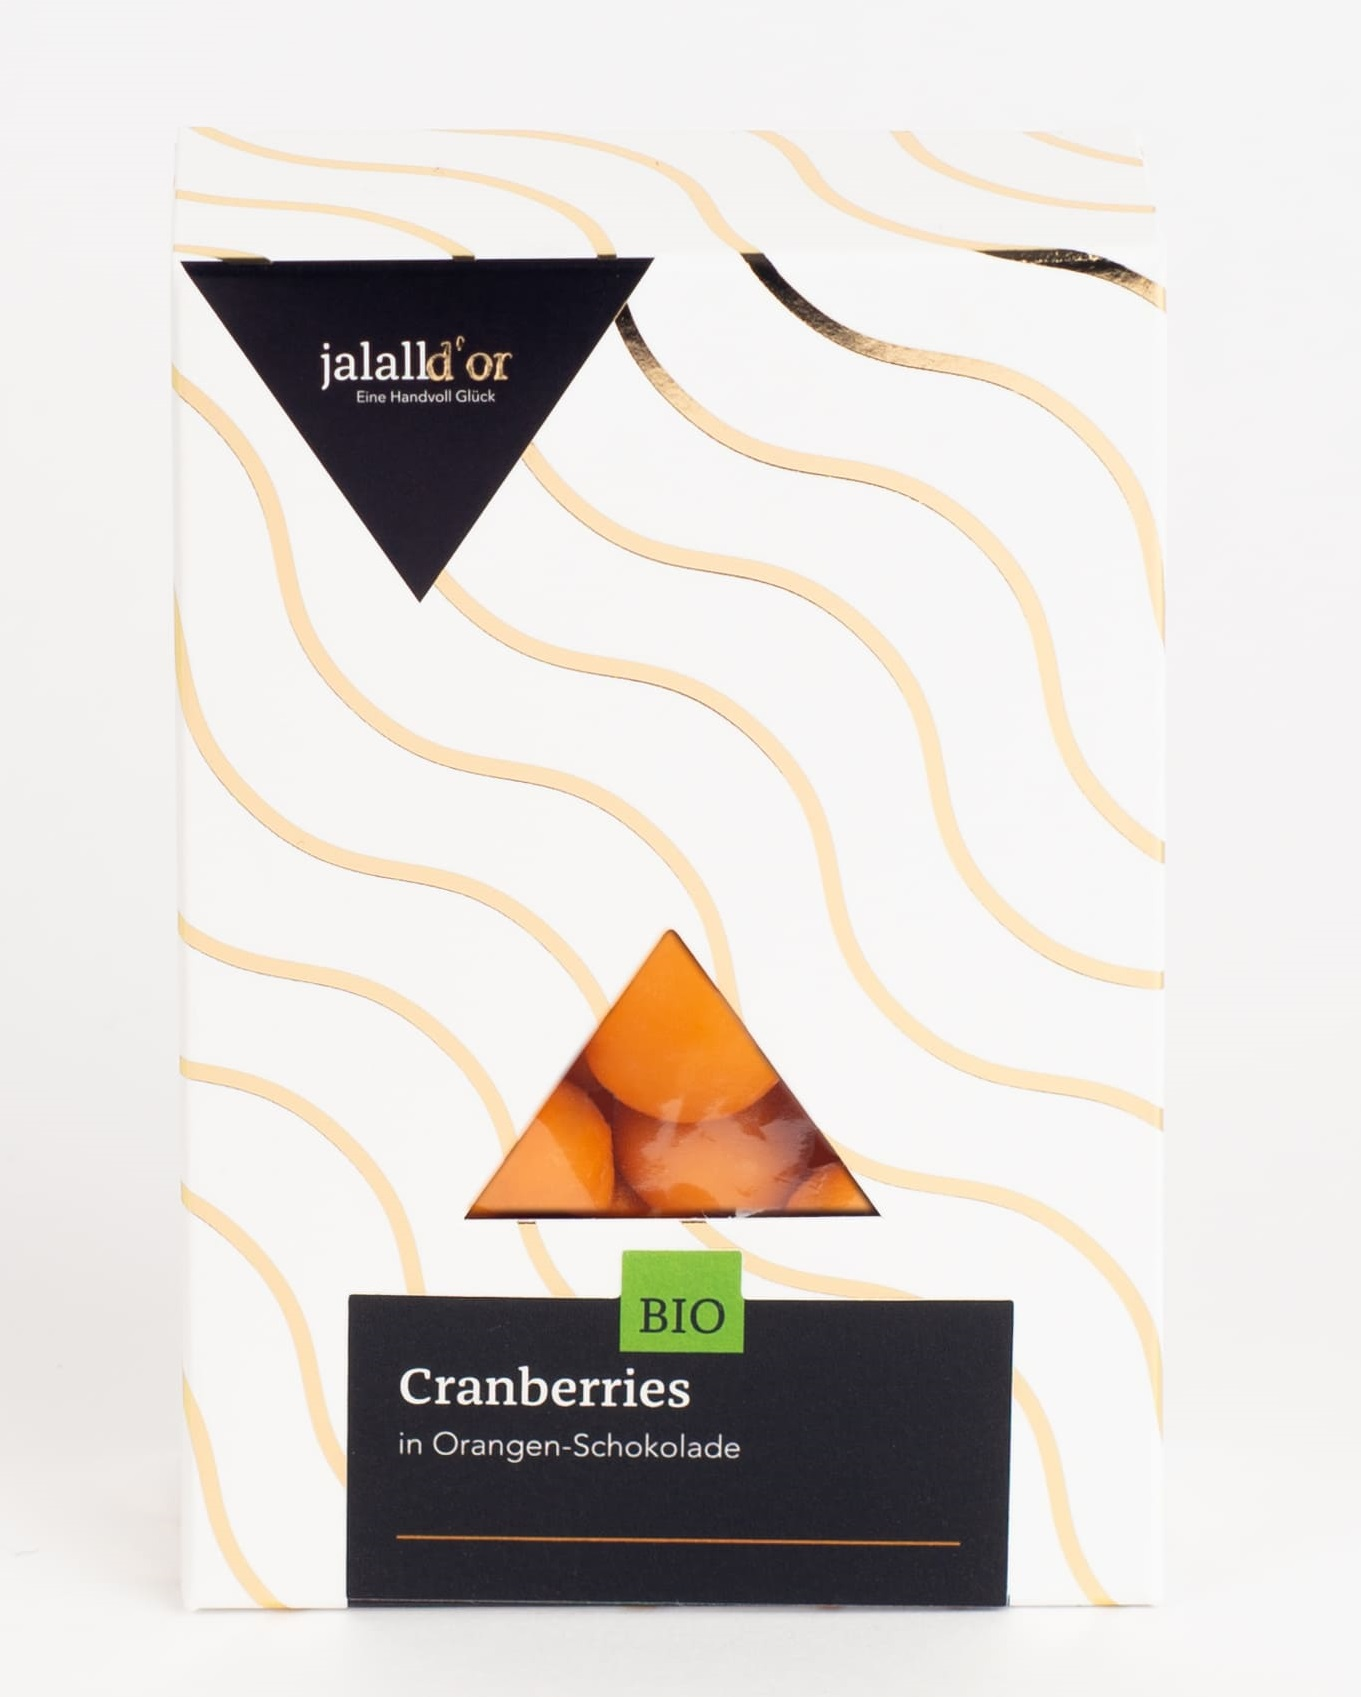 Cranberries in Orangen-Schokolade bio